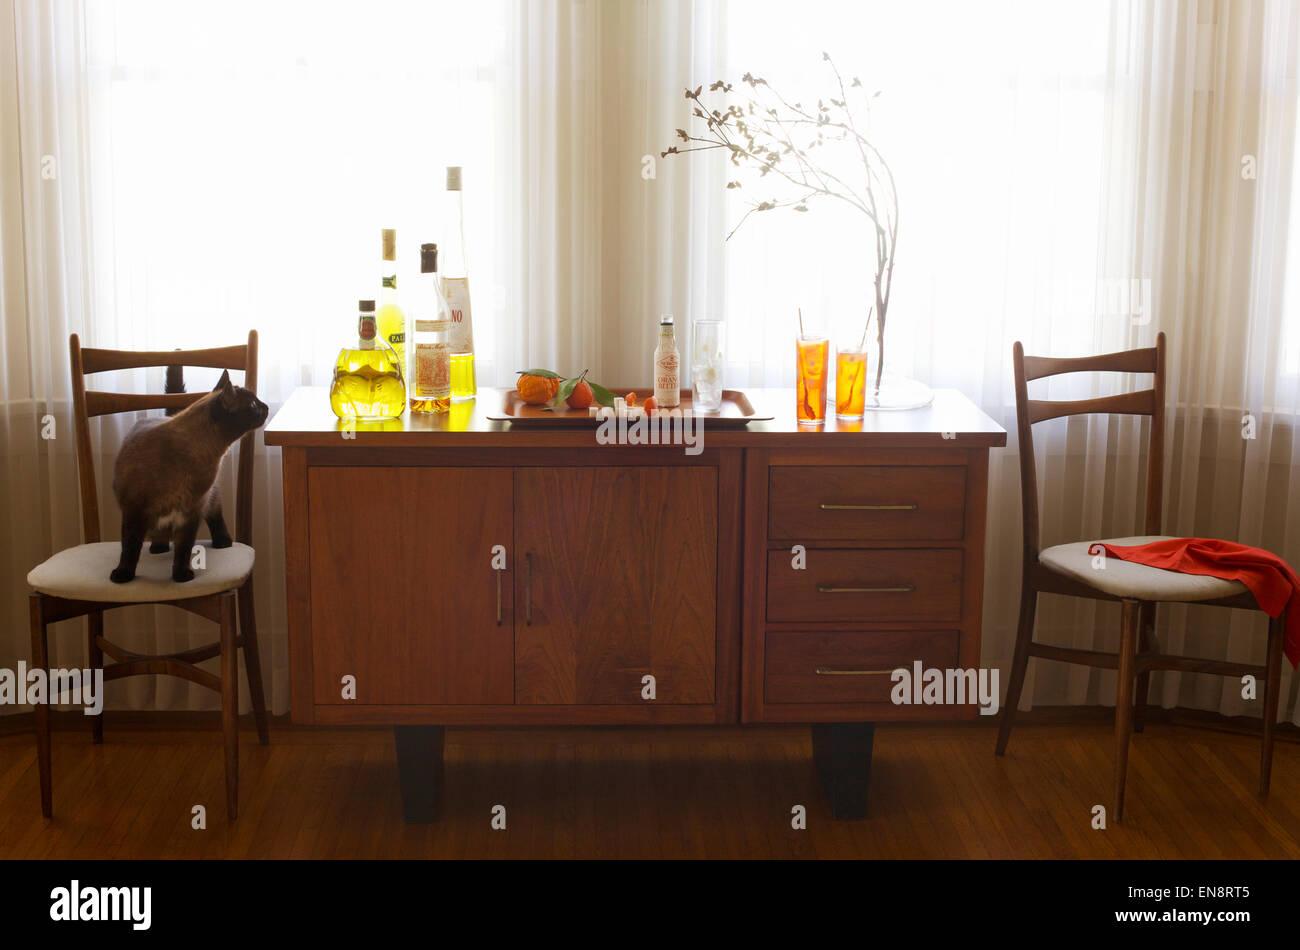 Cocktail Cabinet Stockfotos & Cocktail Cabinet Bilder - Alamy